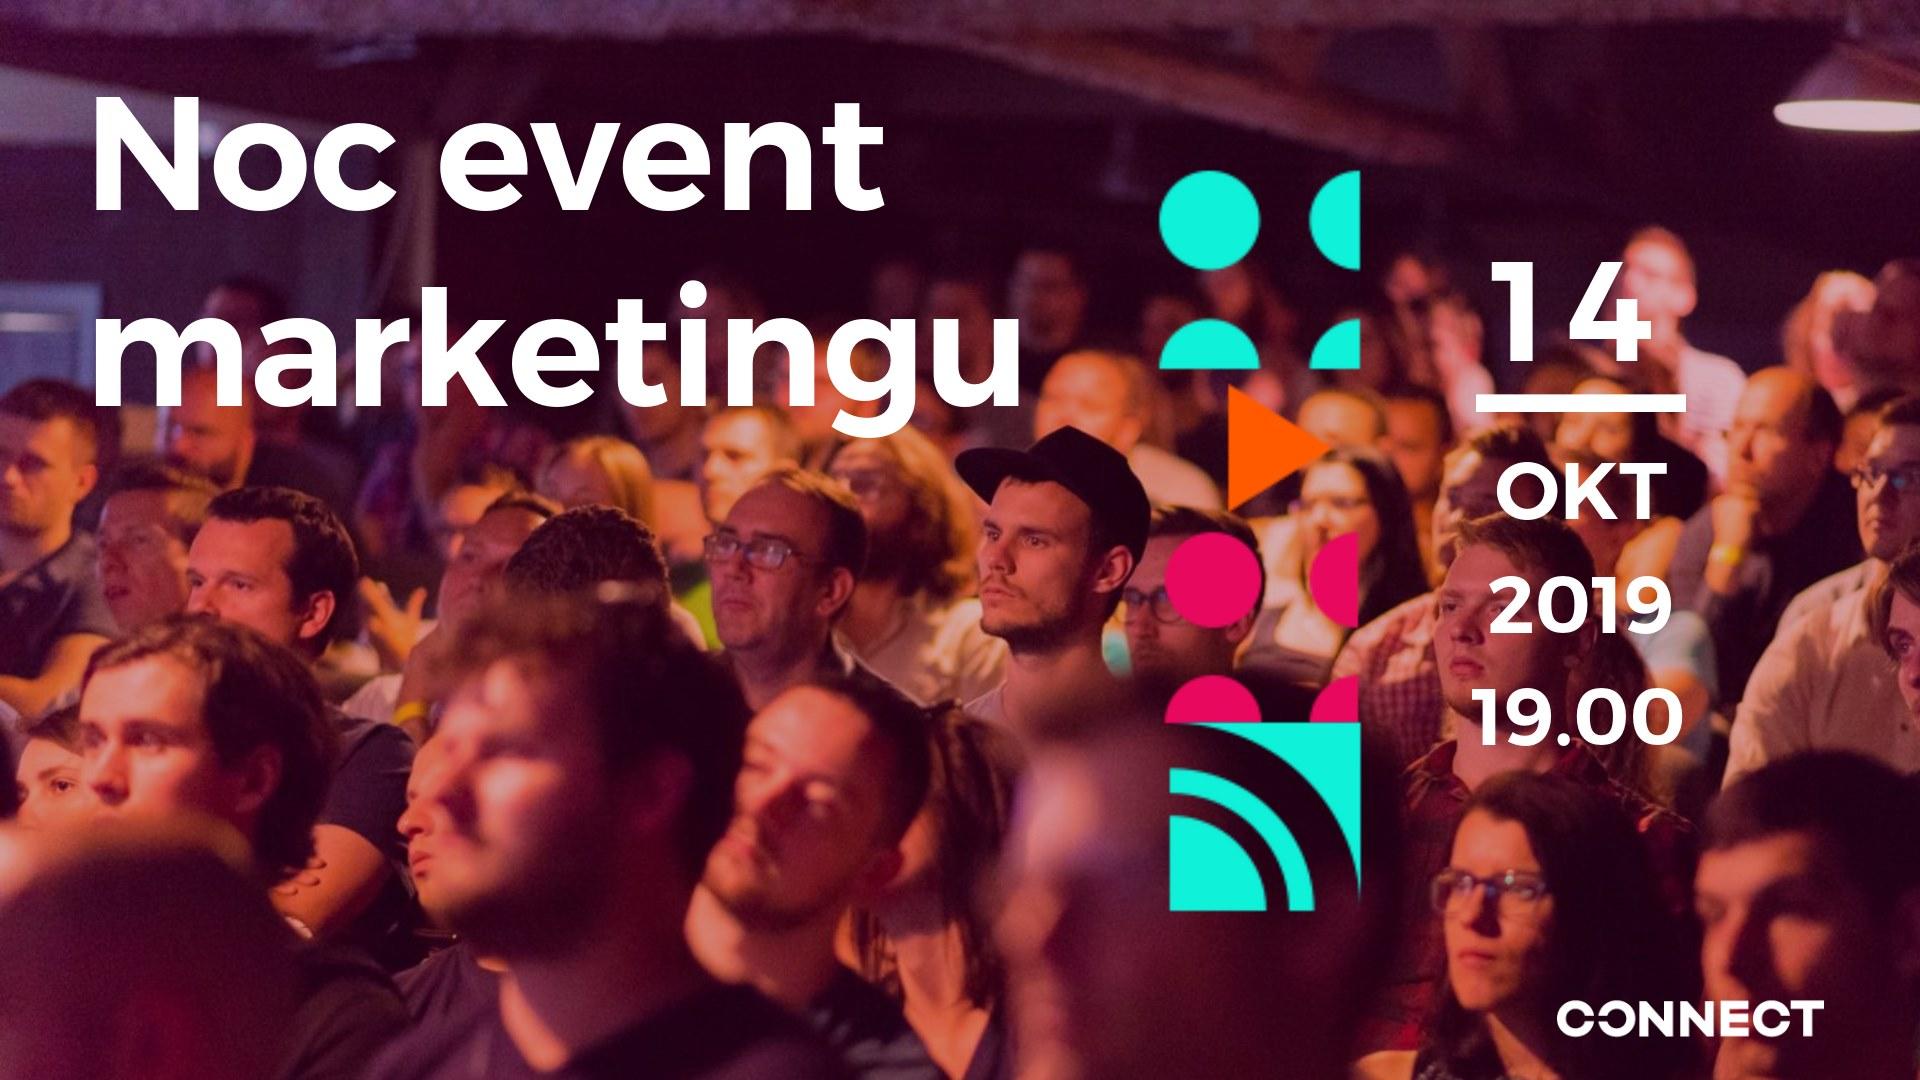 Noc event marketingu – Október 2019